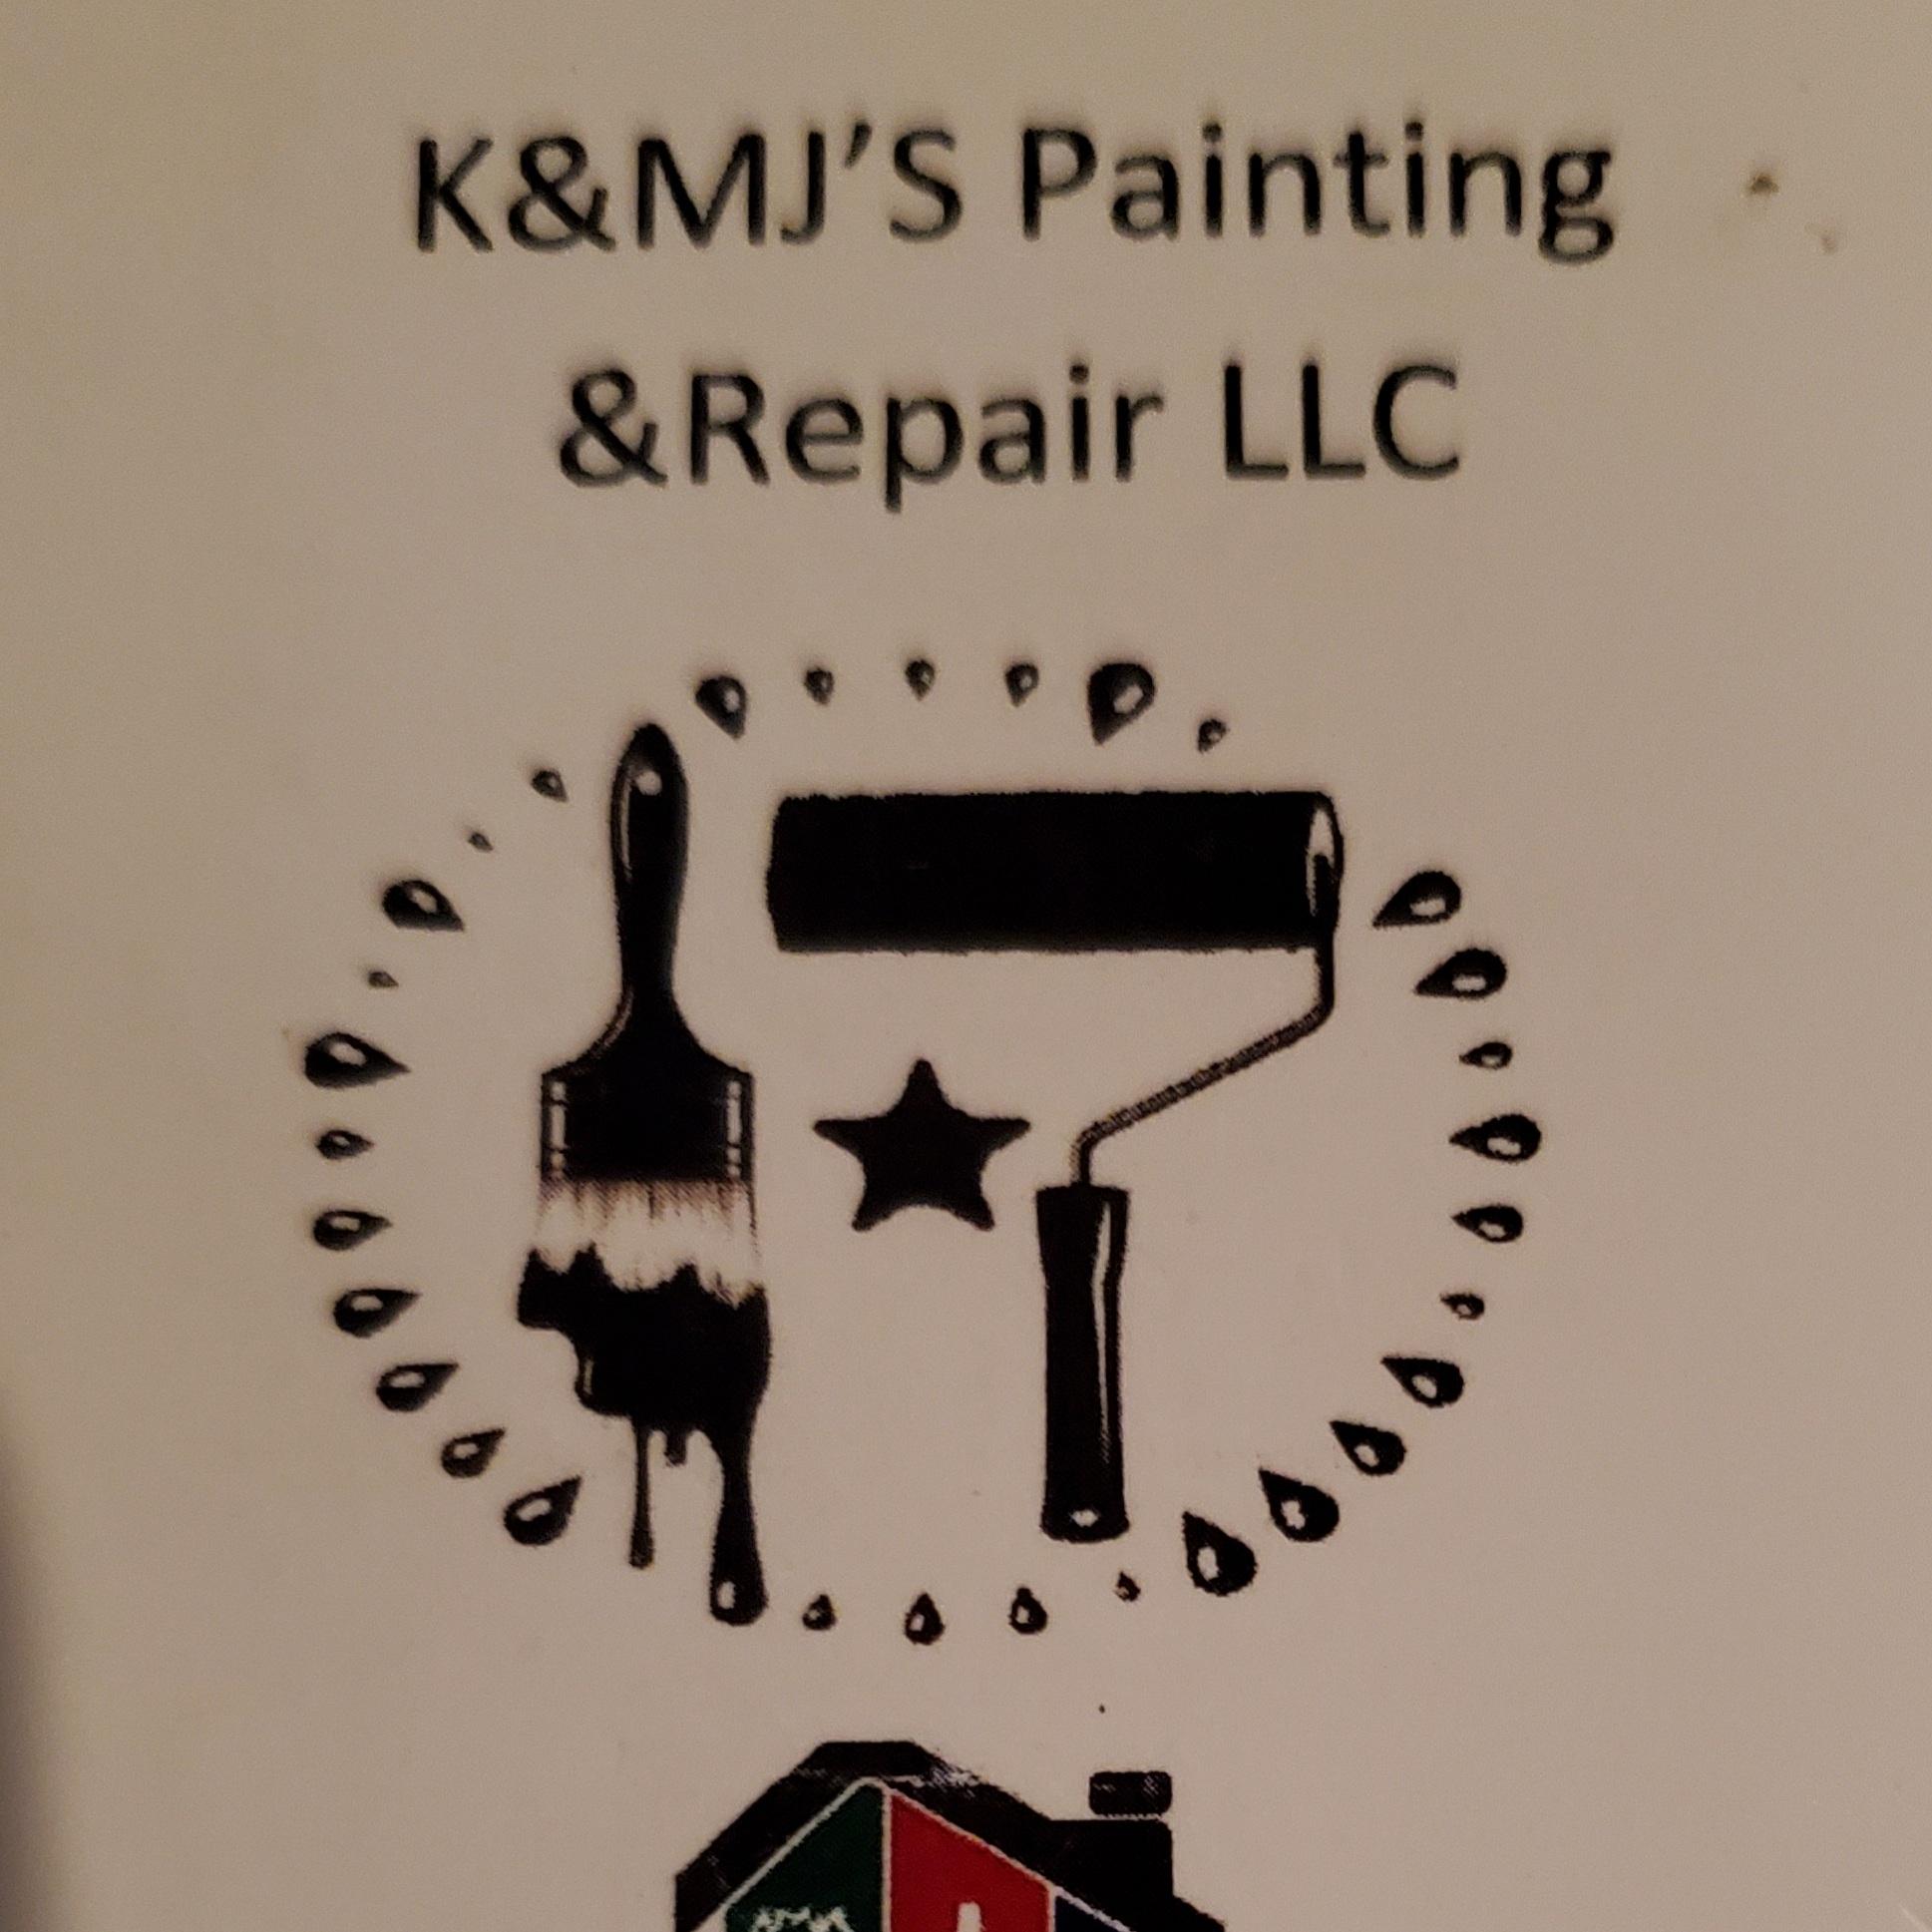 K&MJ'S Painting and Repairs LLC